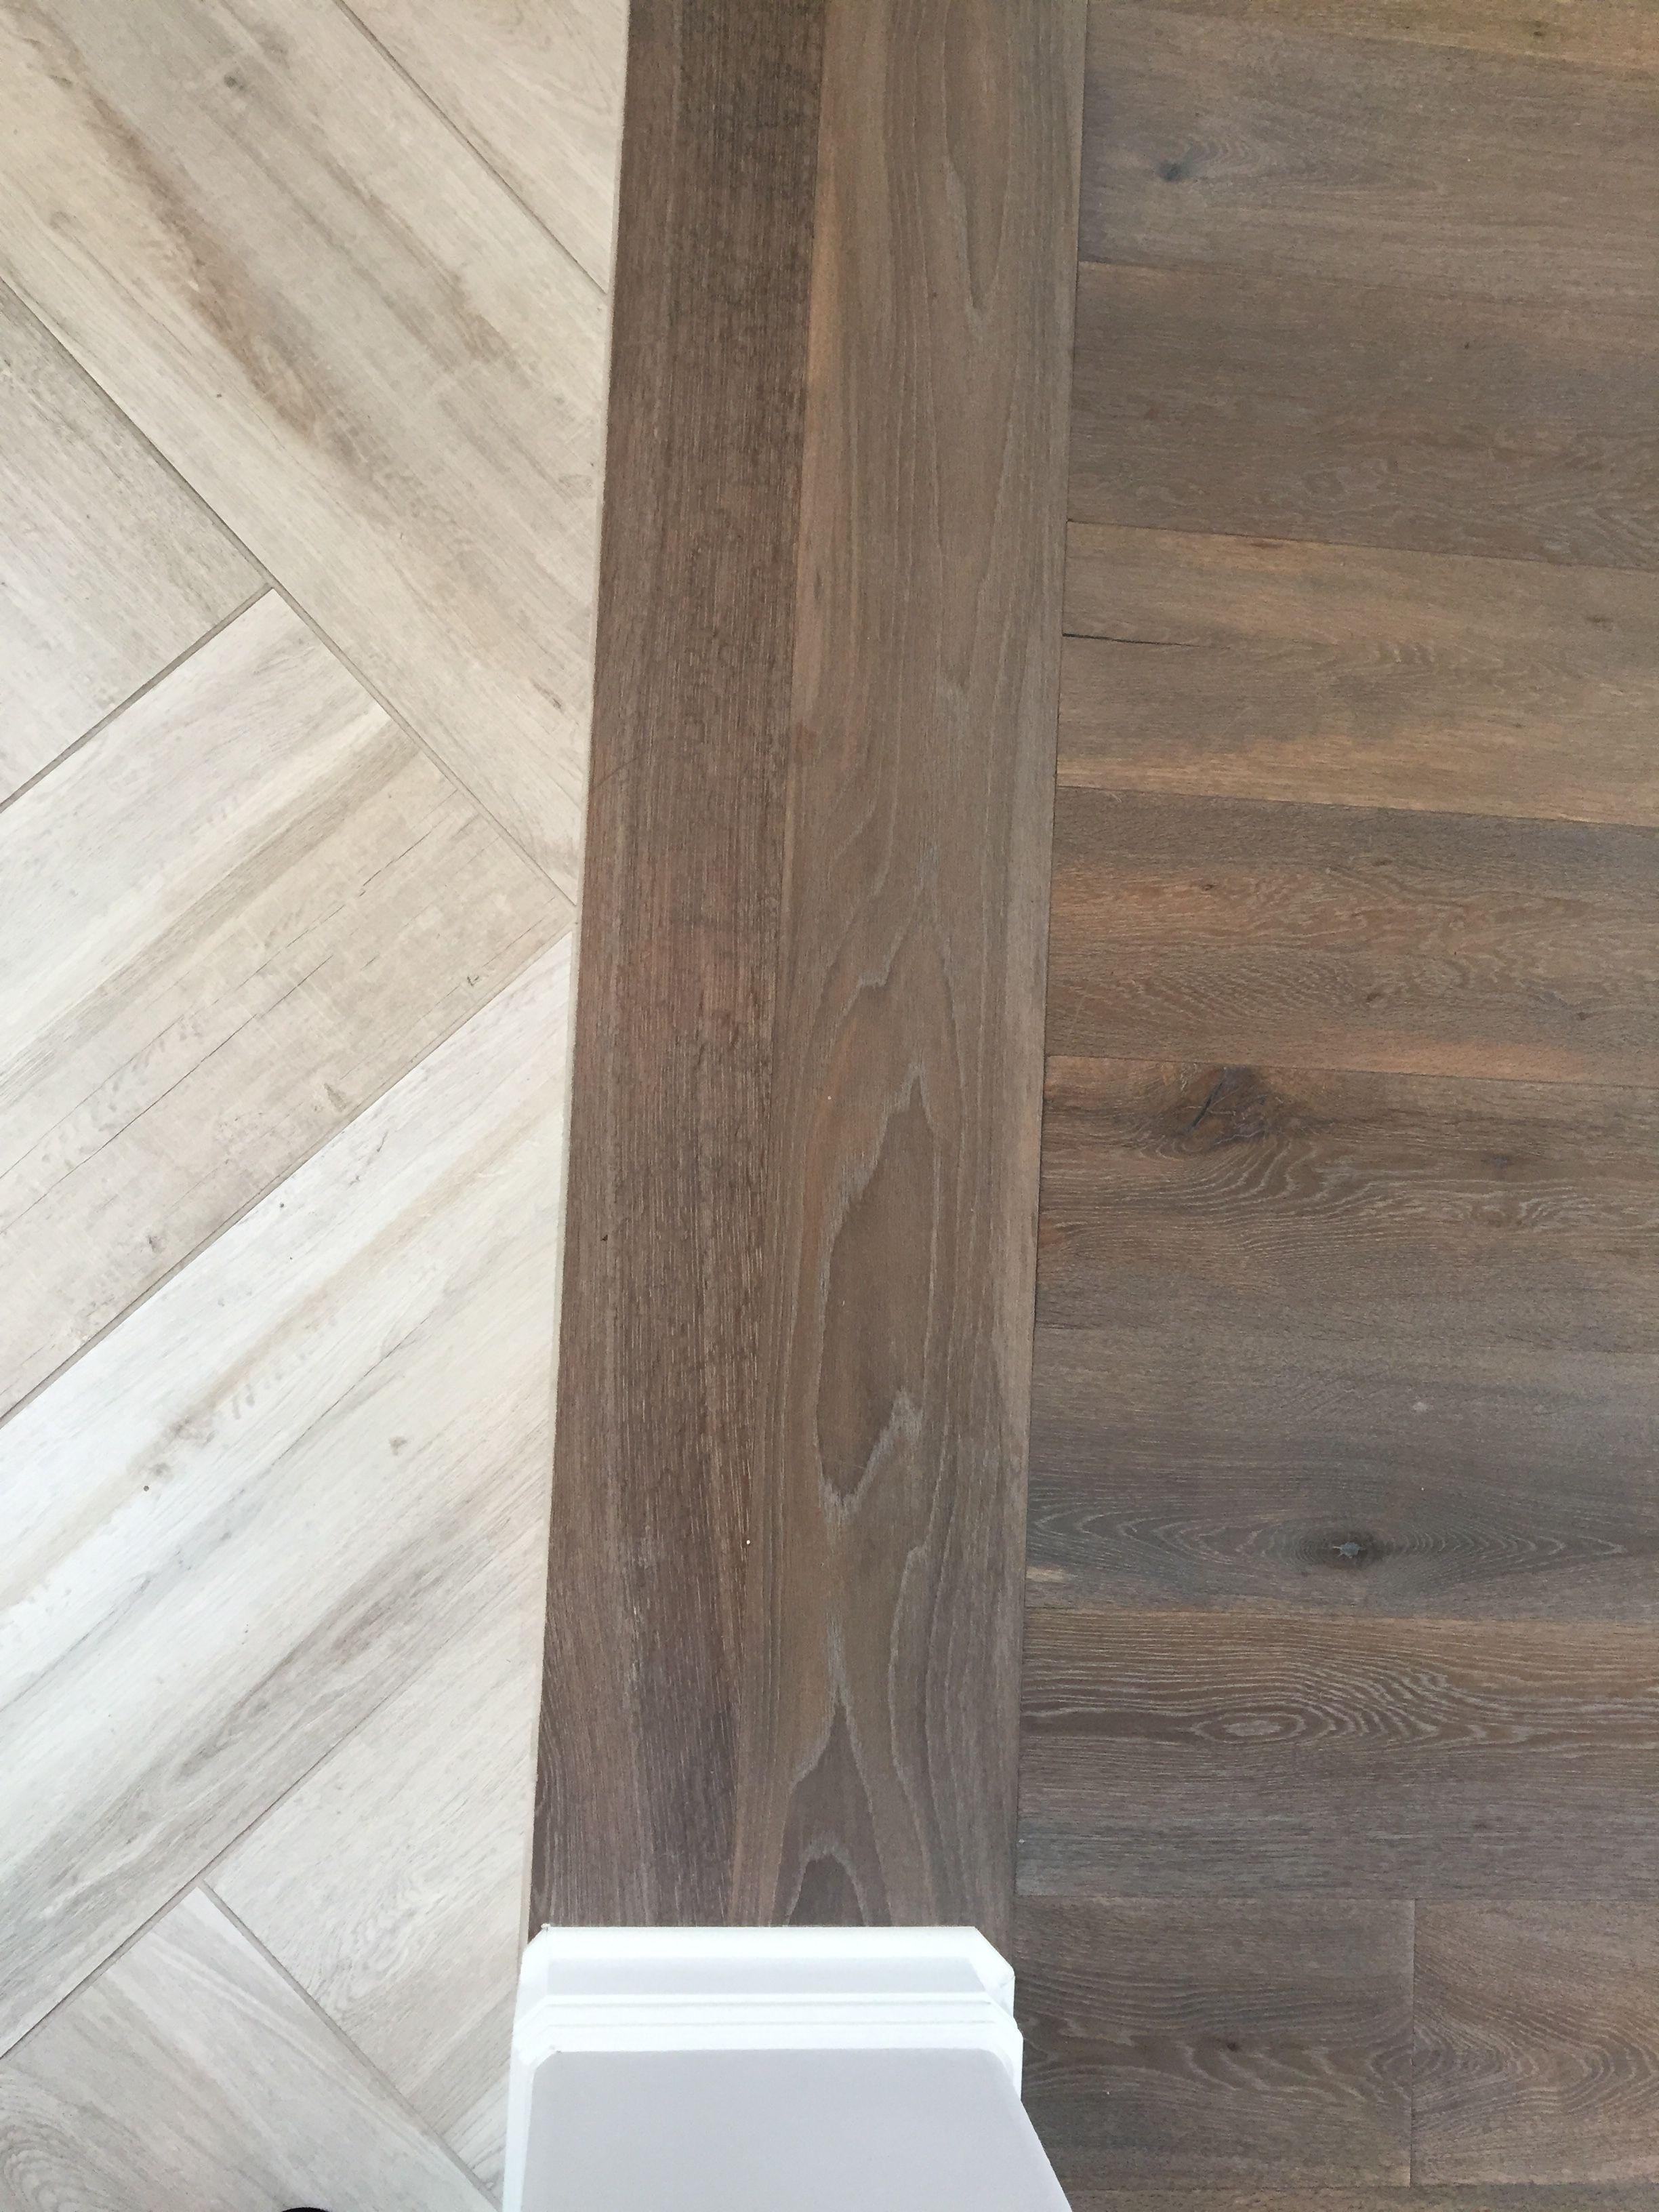 different types of hardwood floors of floor transition laminate to herringbone tile pattern model with regard to floor transition laminate to herringbone tile pattern herringbone tile pattern herringbone wood floor